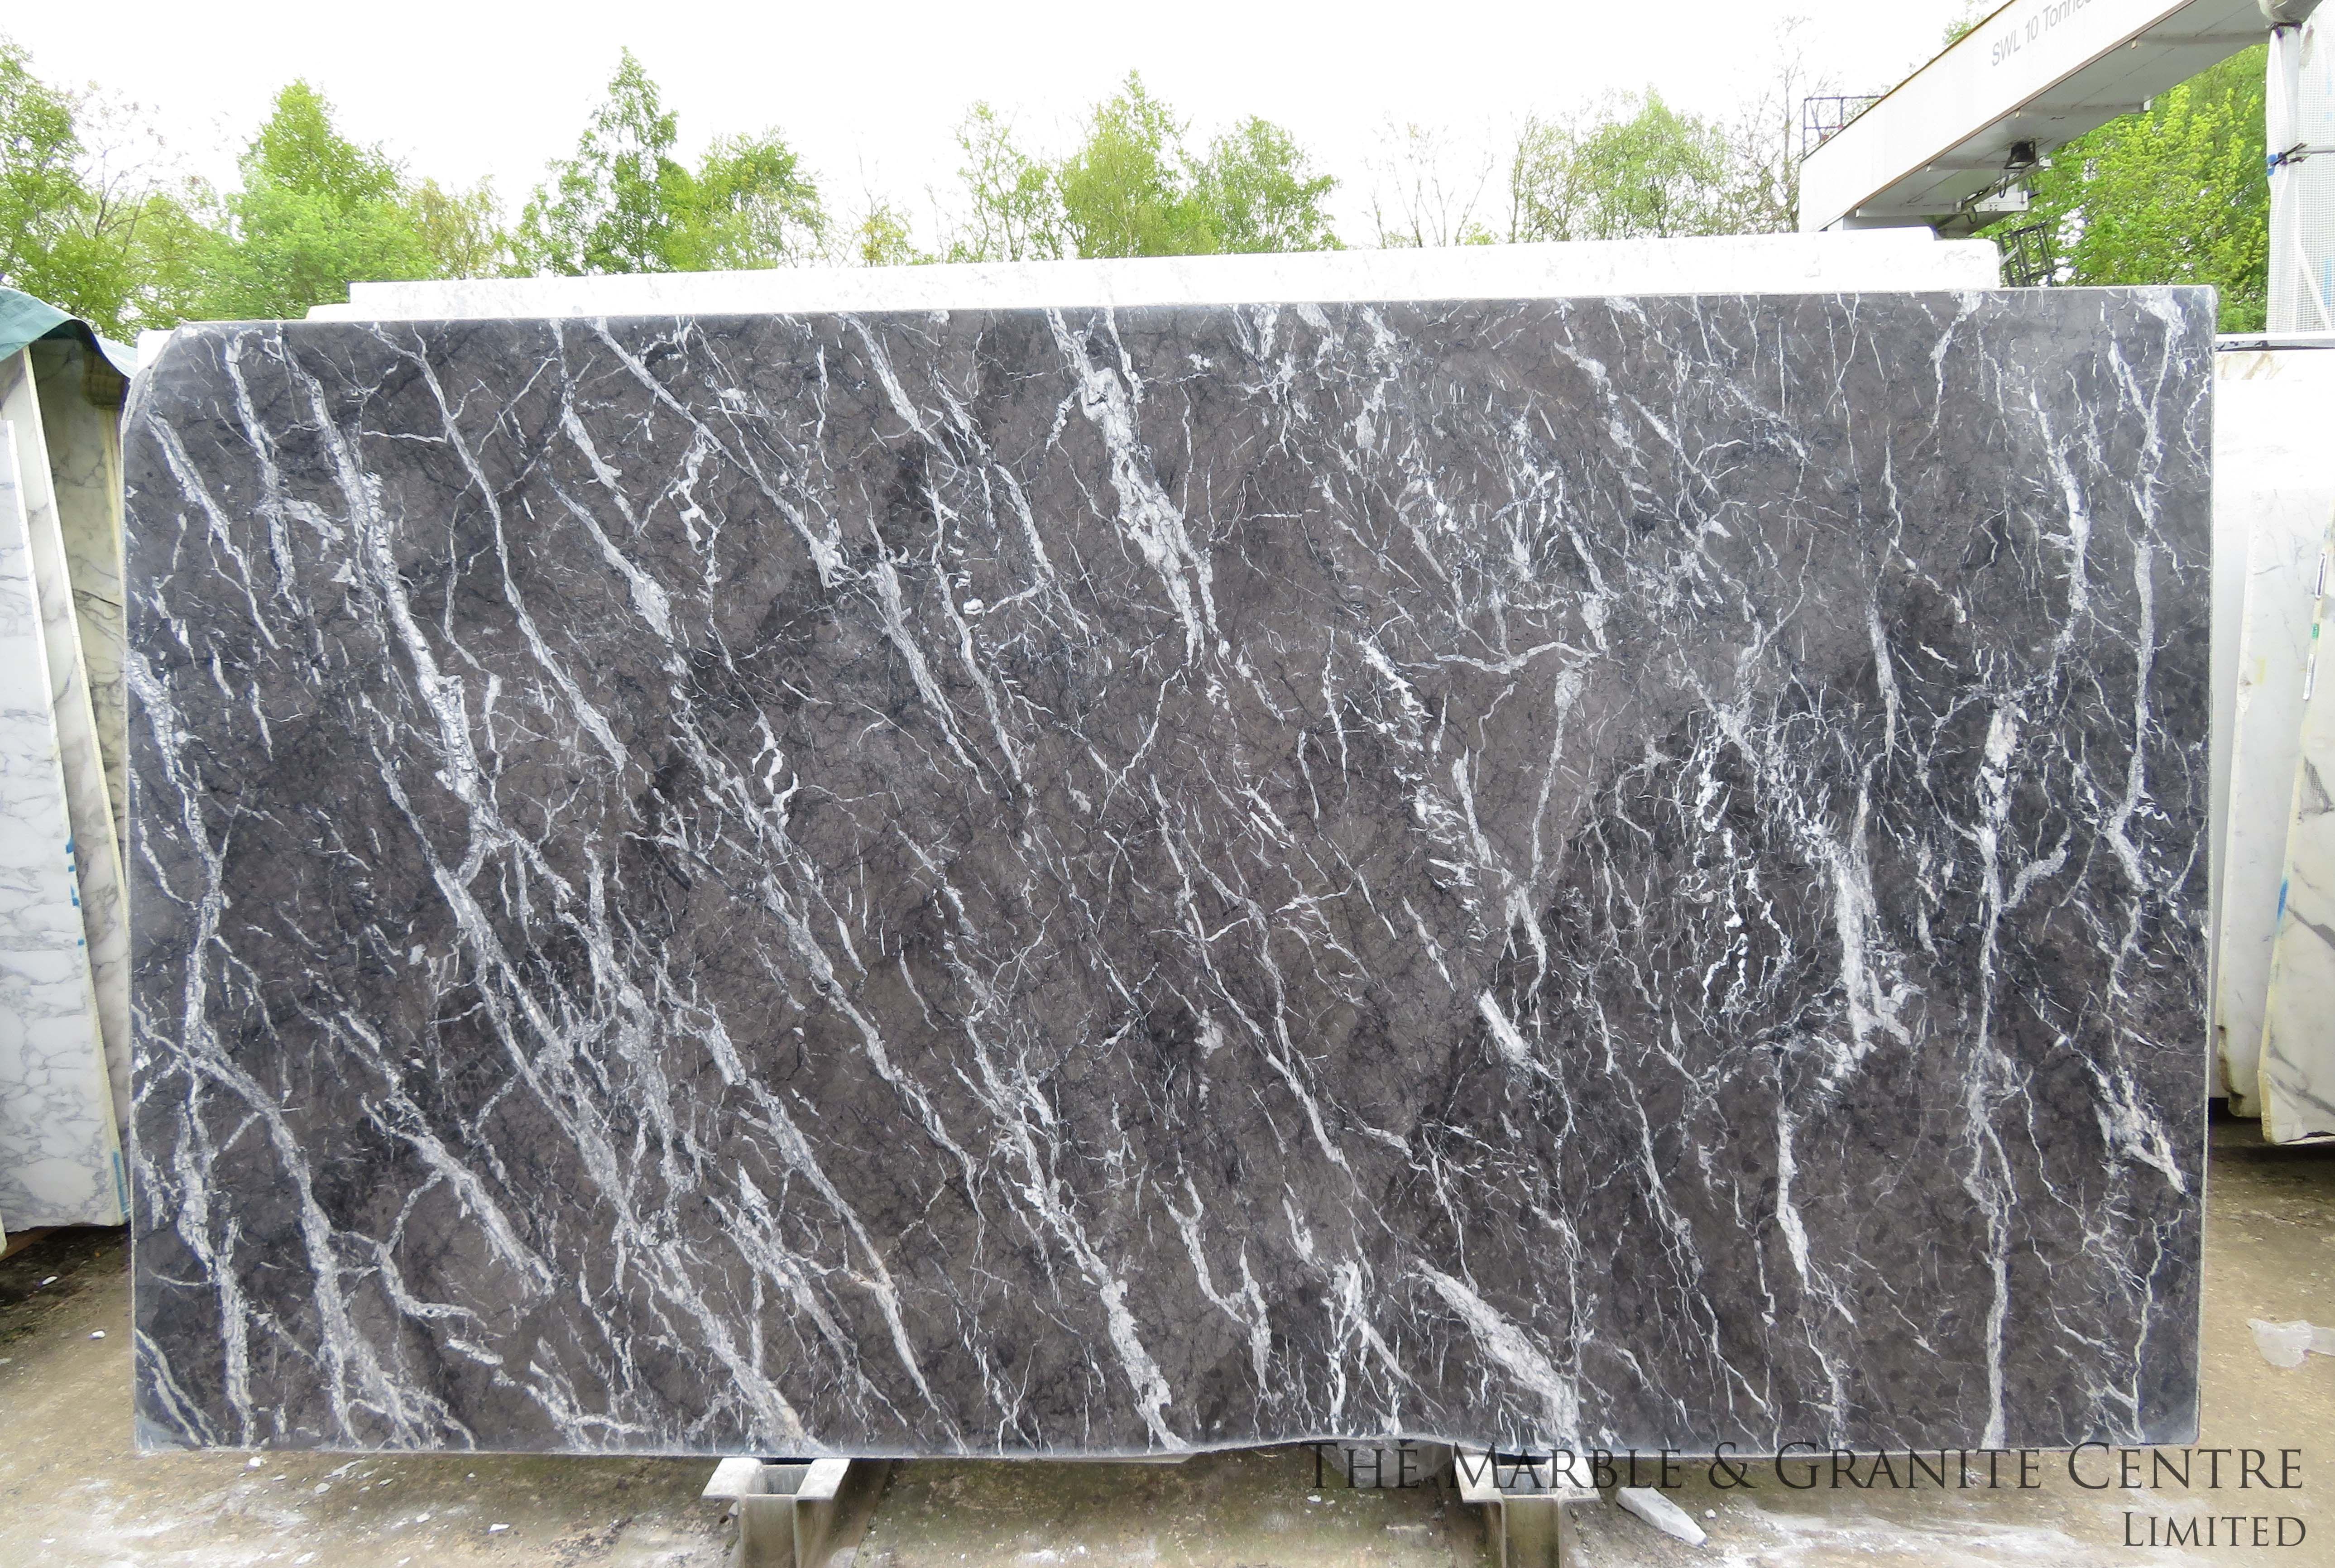 Grigio Carnico Polished Slabs Block No 12021 Https Www Themarbleandgranitecentre Co Uk Slabview Id 2397 At The Marble Marble Granite Stone Slab Granite